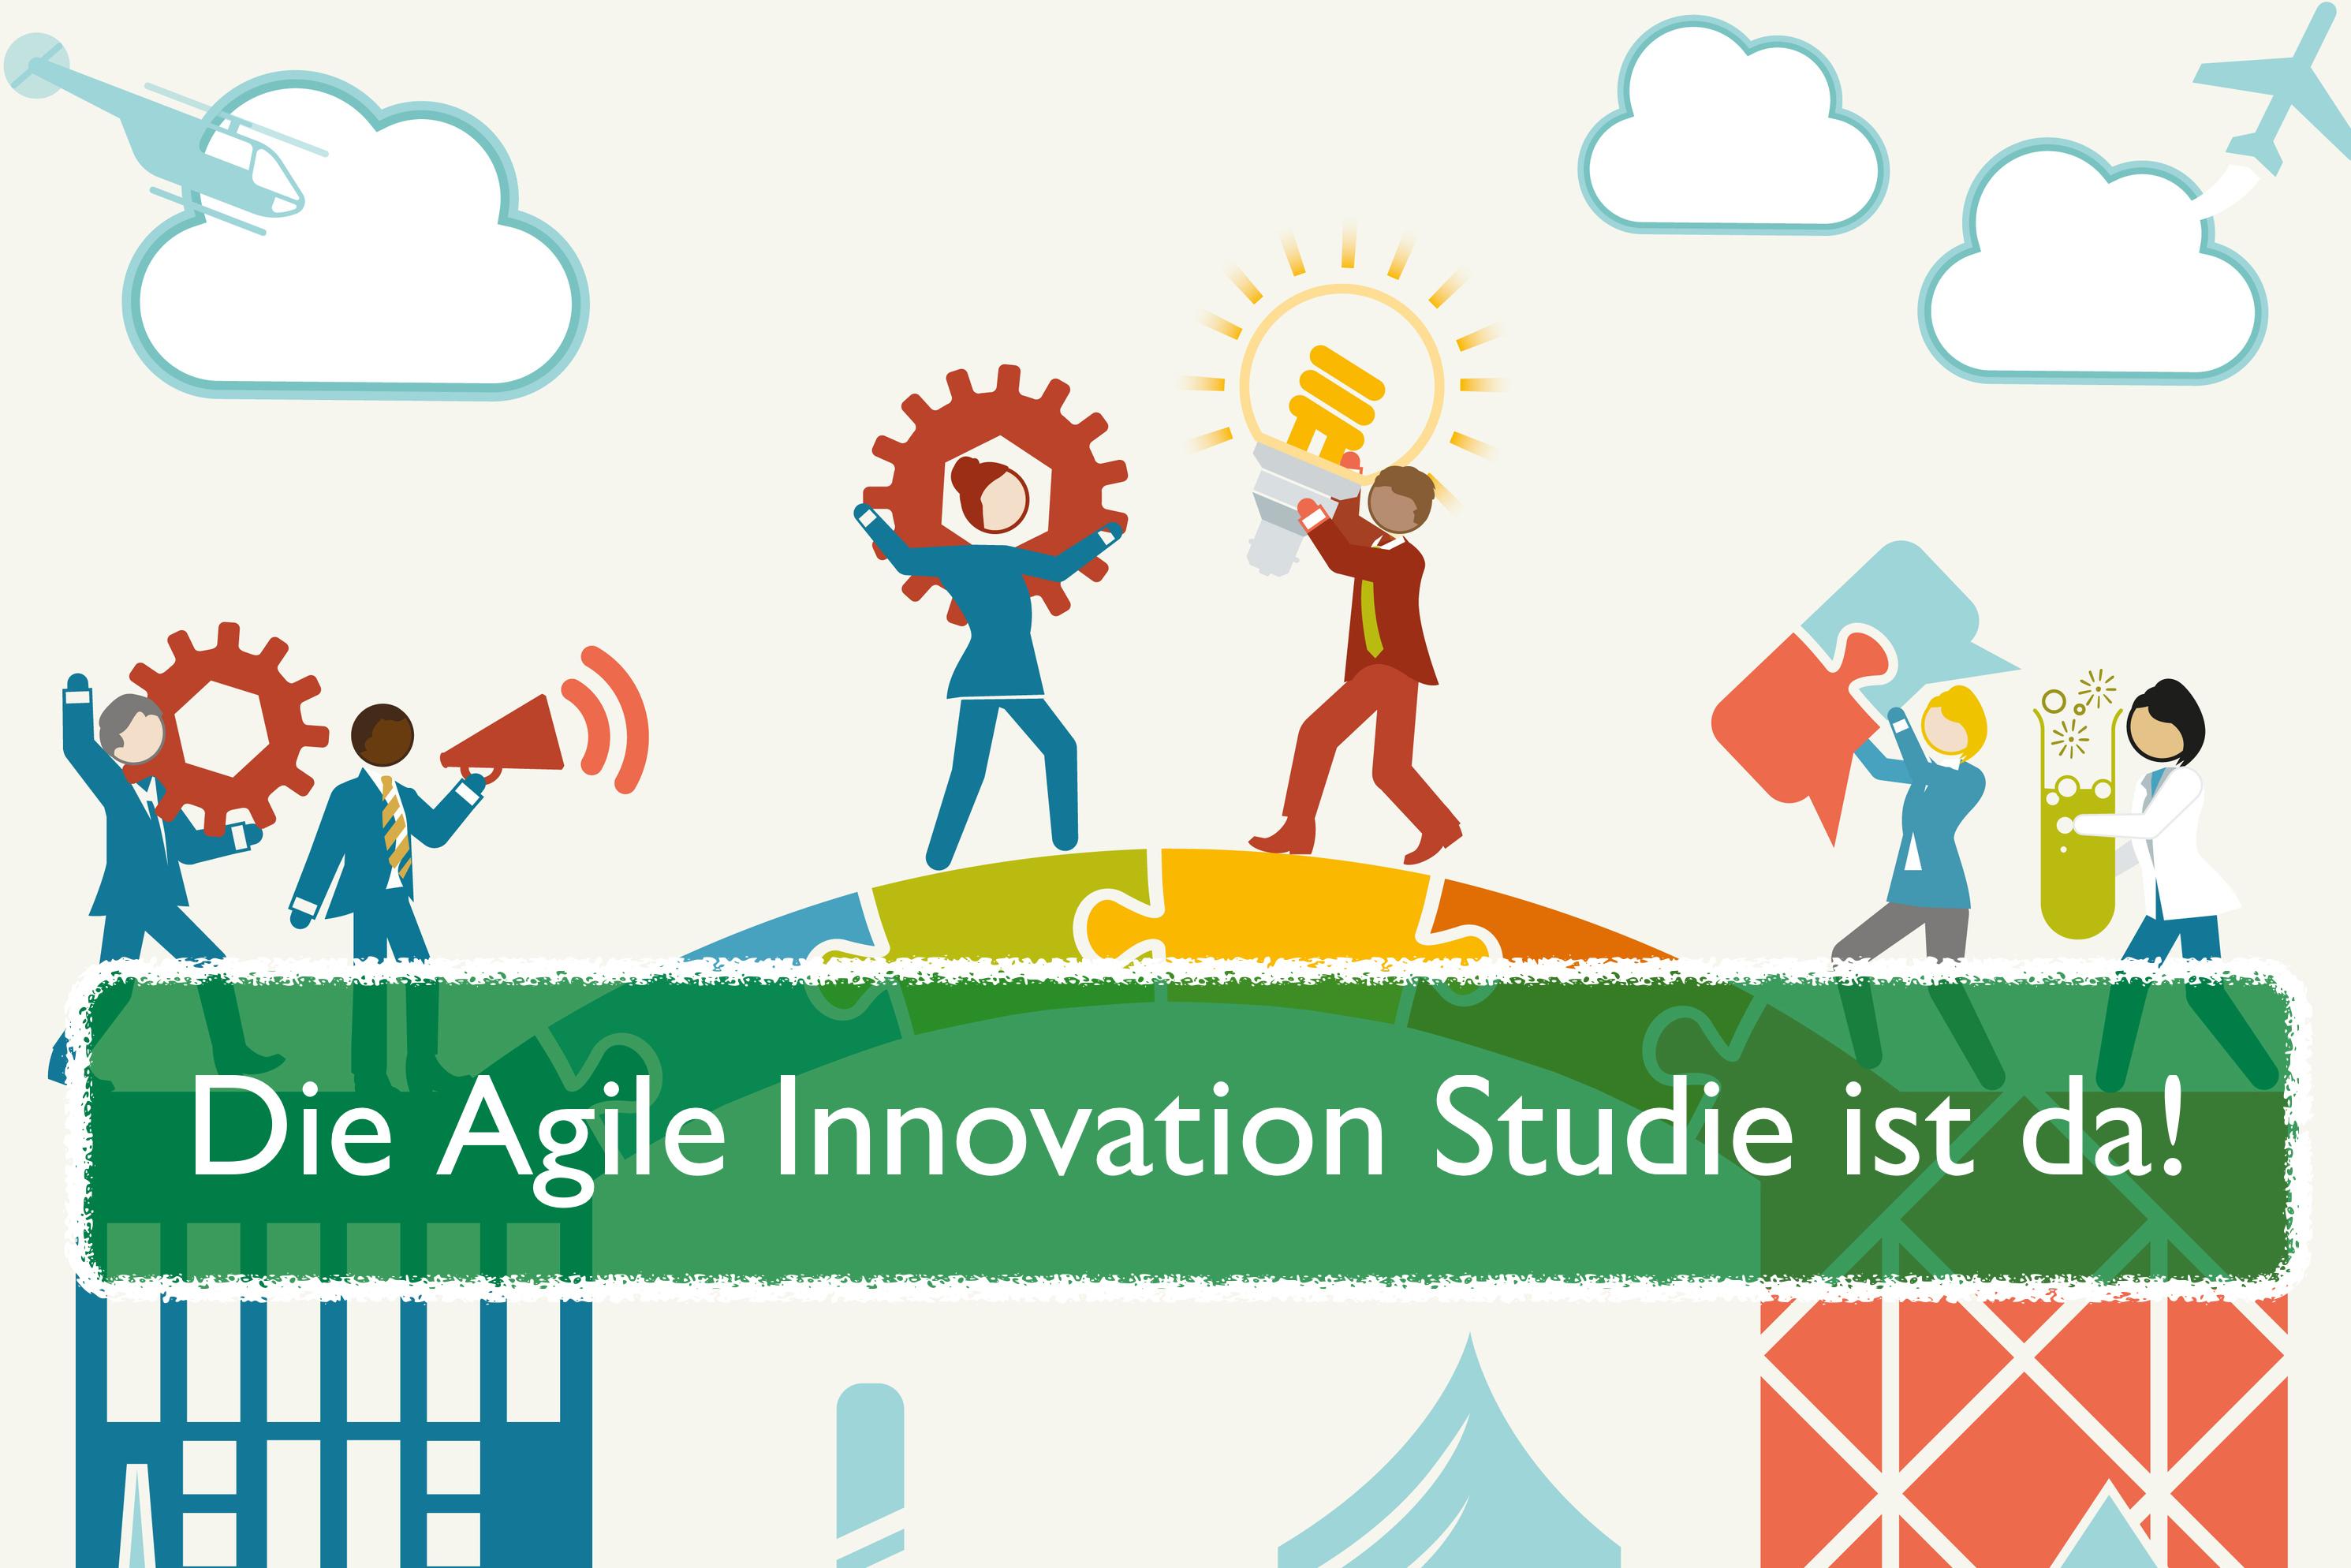 Unsere Agile Innovation Studie ist da!